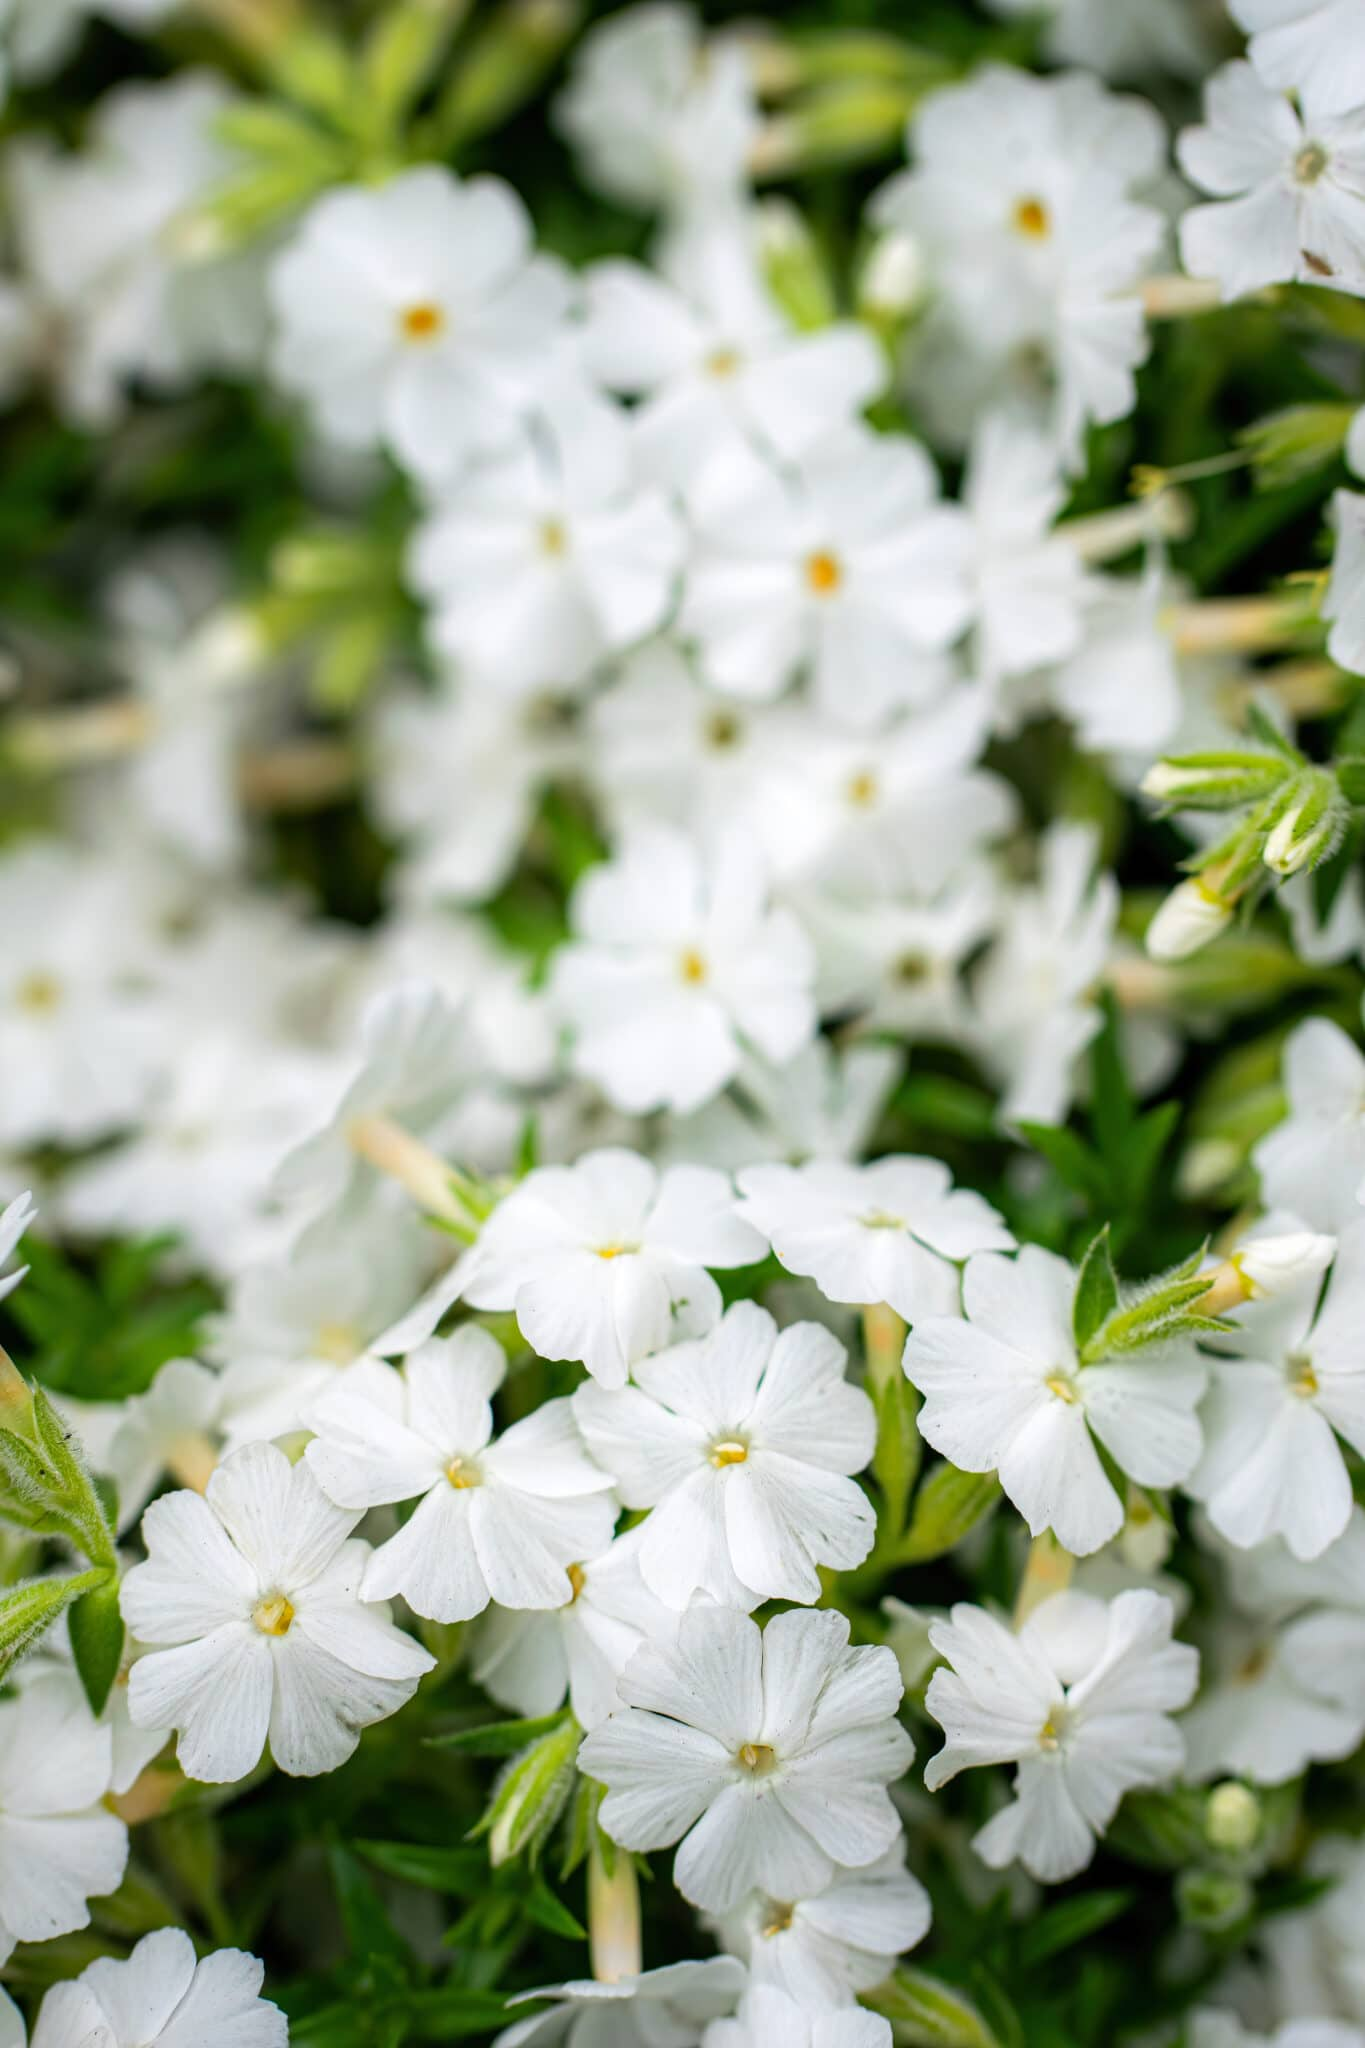 White phlox flower close up in garden on a summer day.